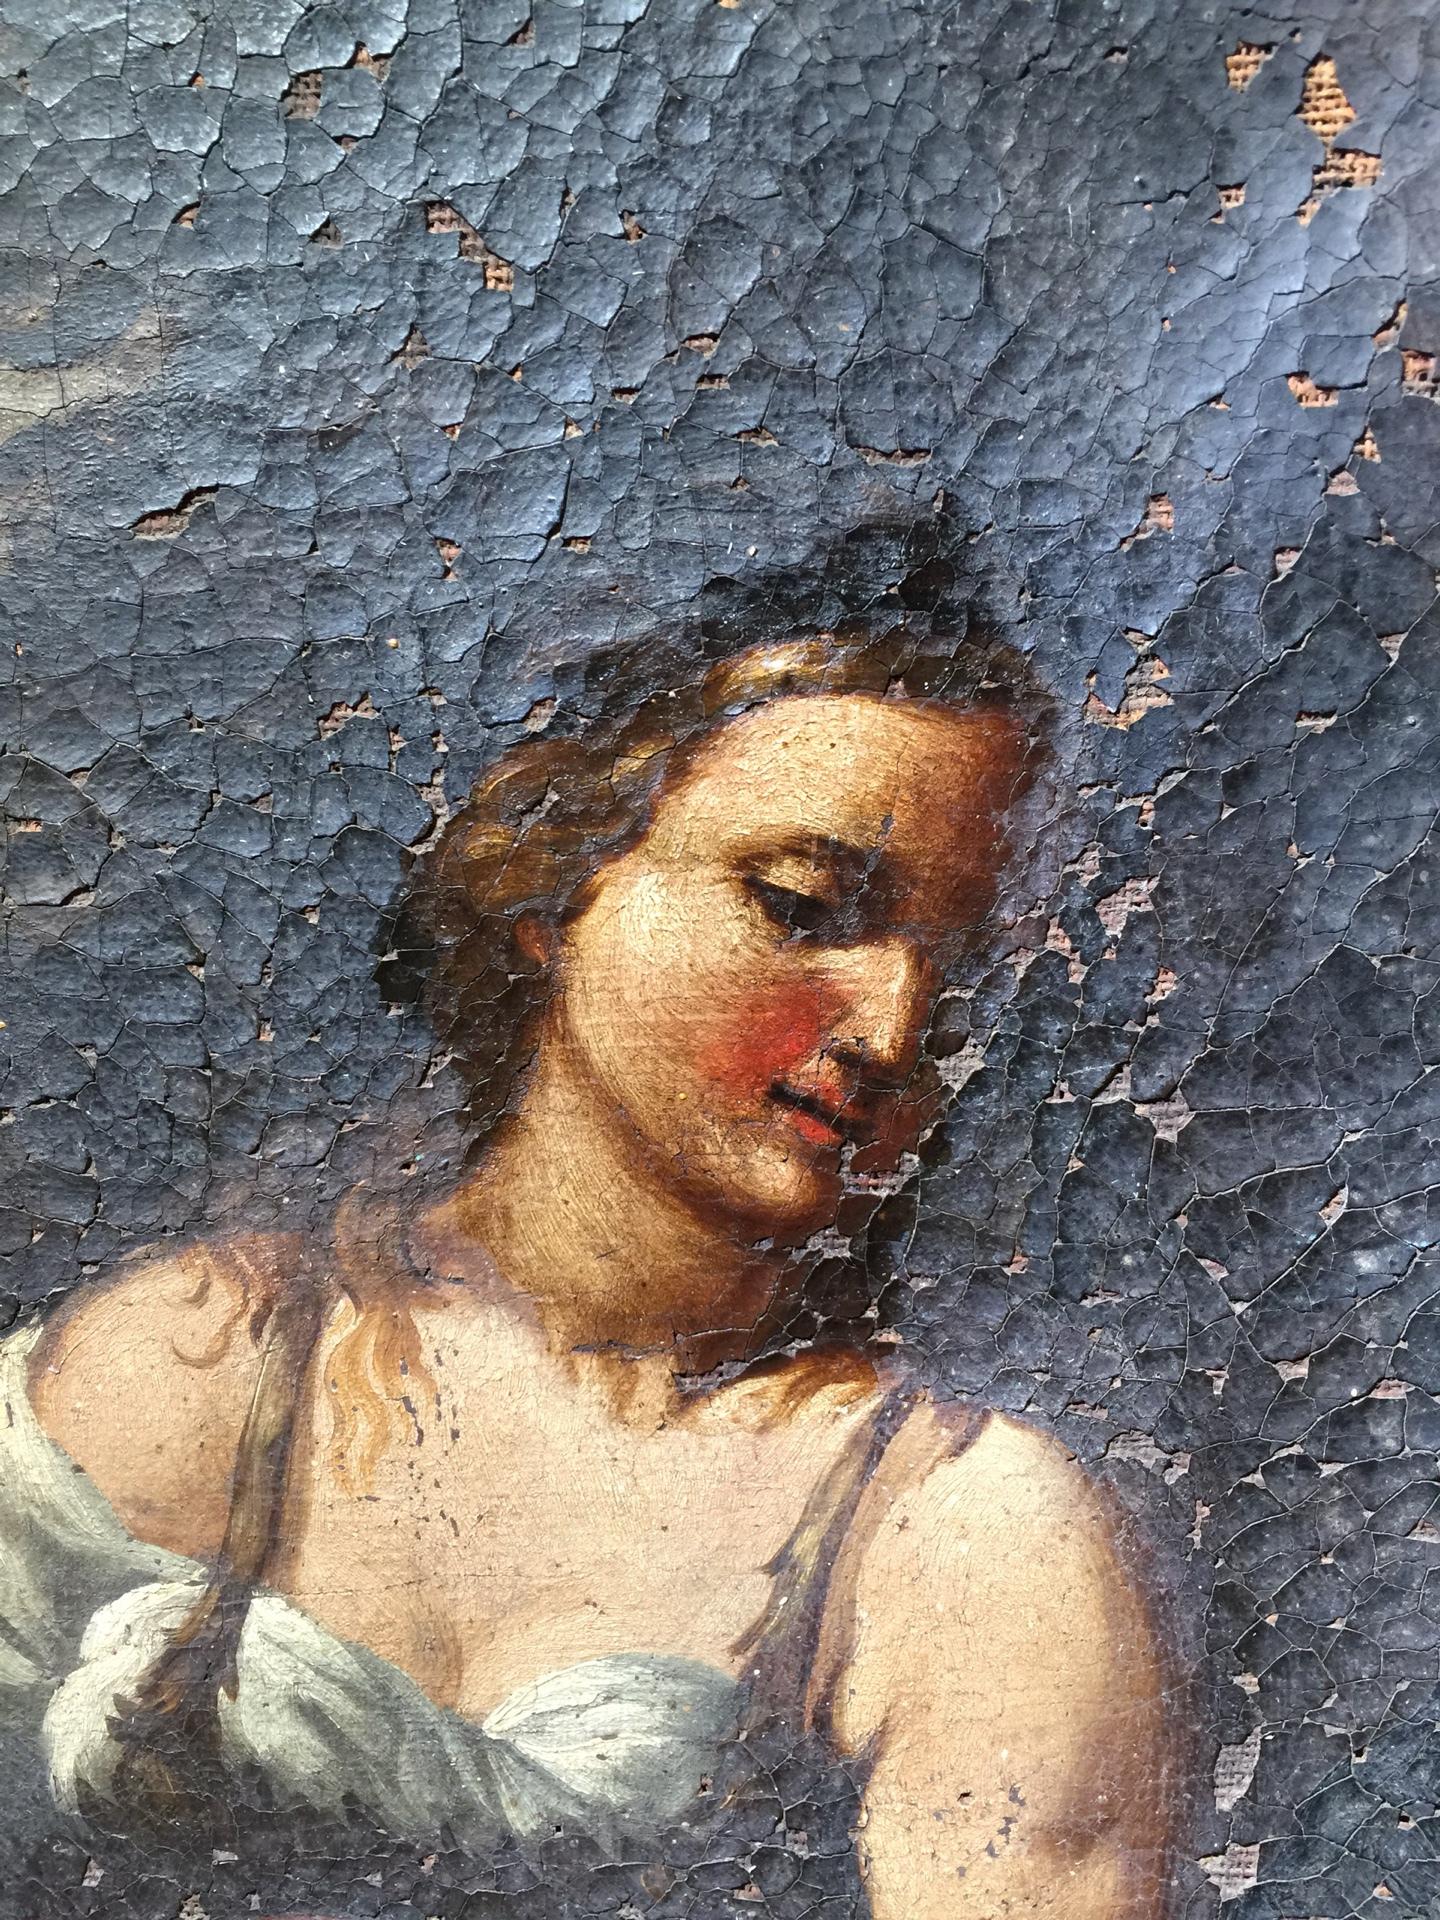 taddei-davoli-restauratori-dei-dipinti-reggio-nell-emilia-thumbnail